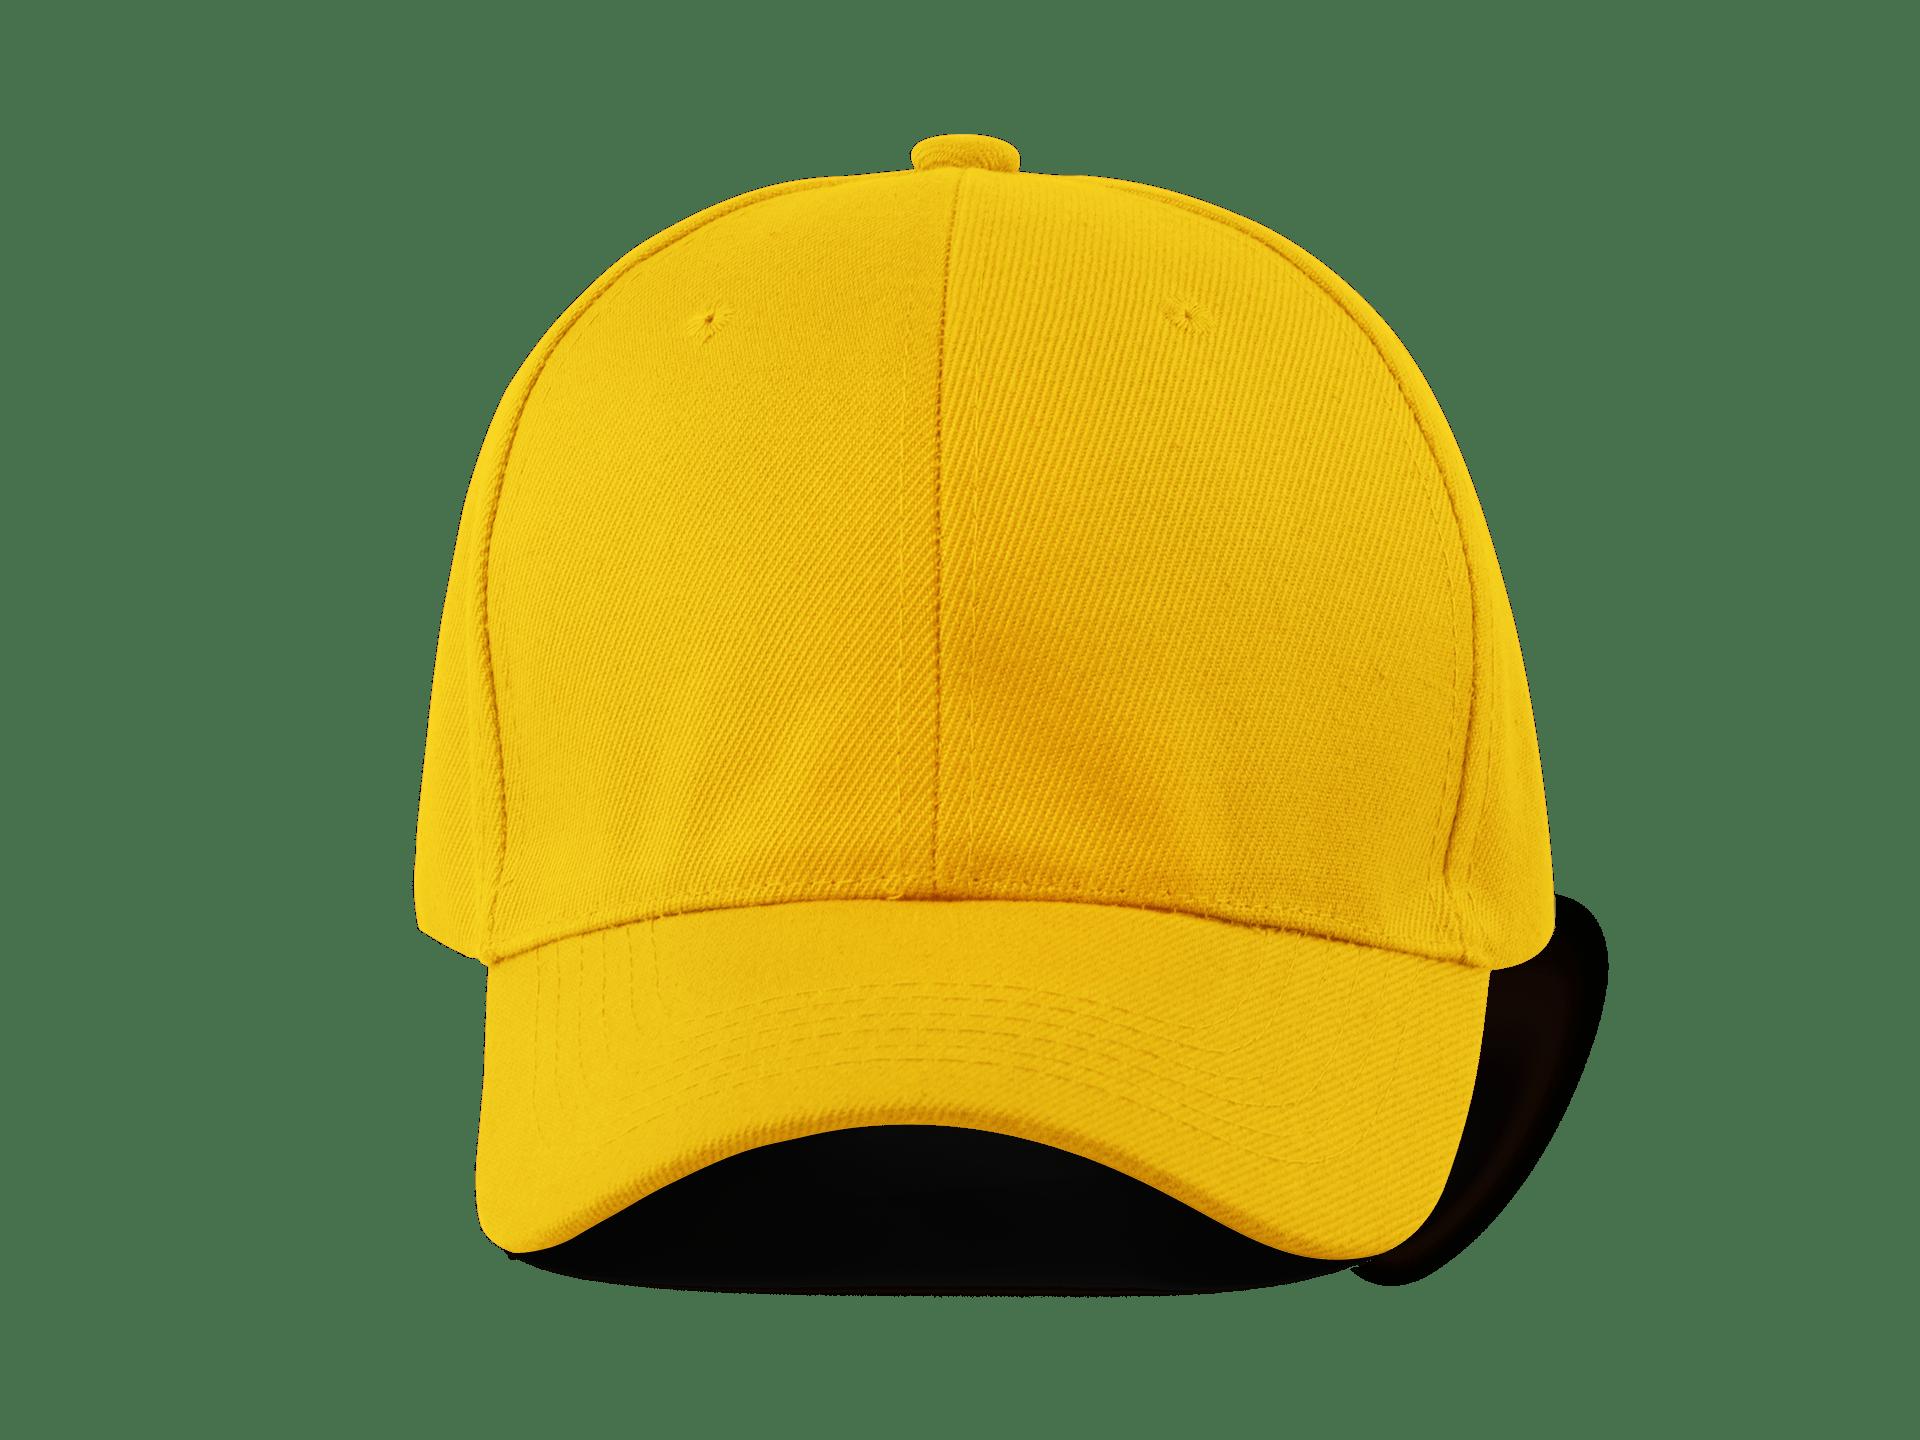 cap-yellow-color